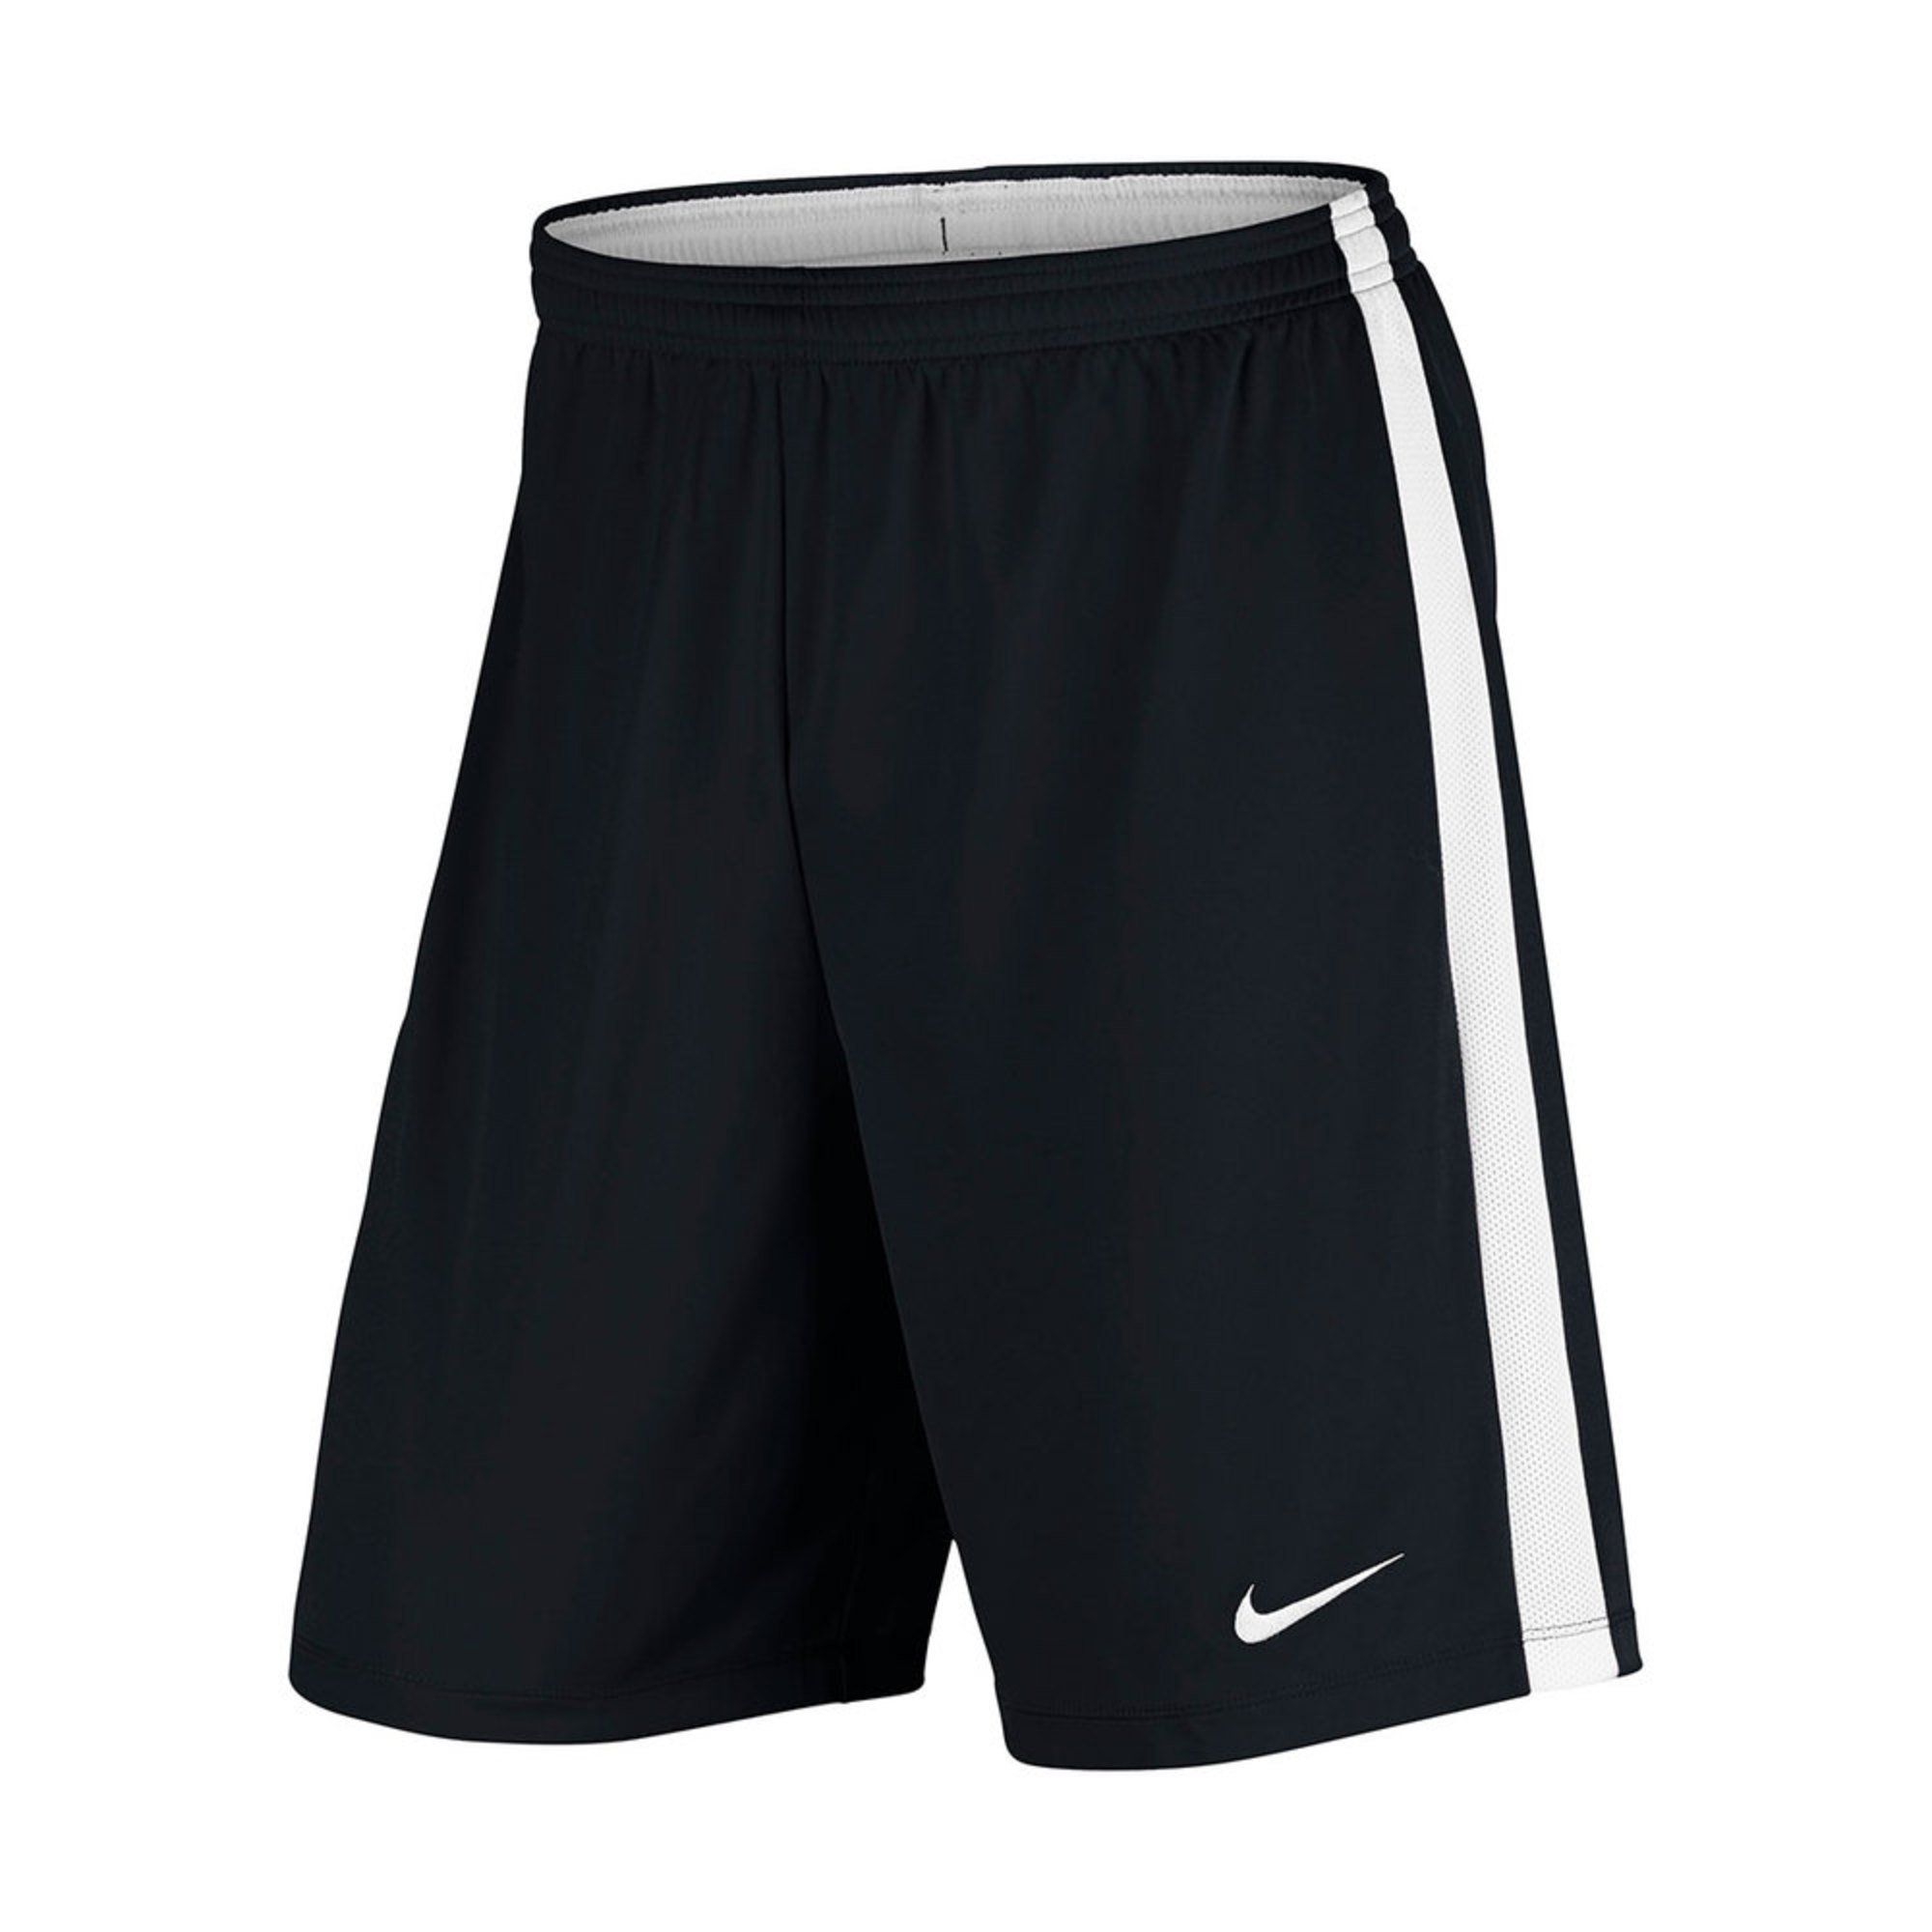 e4471abd0 Nike Men's Academy Knit Soccer Shorts In Black | Active Shorts ...